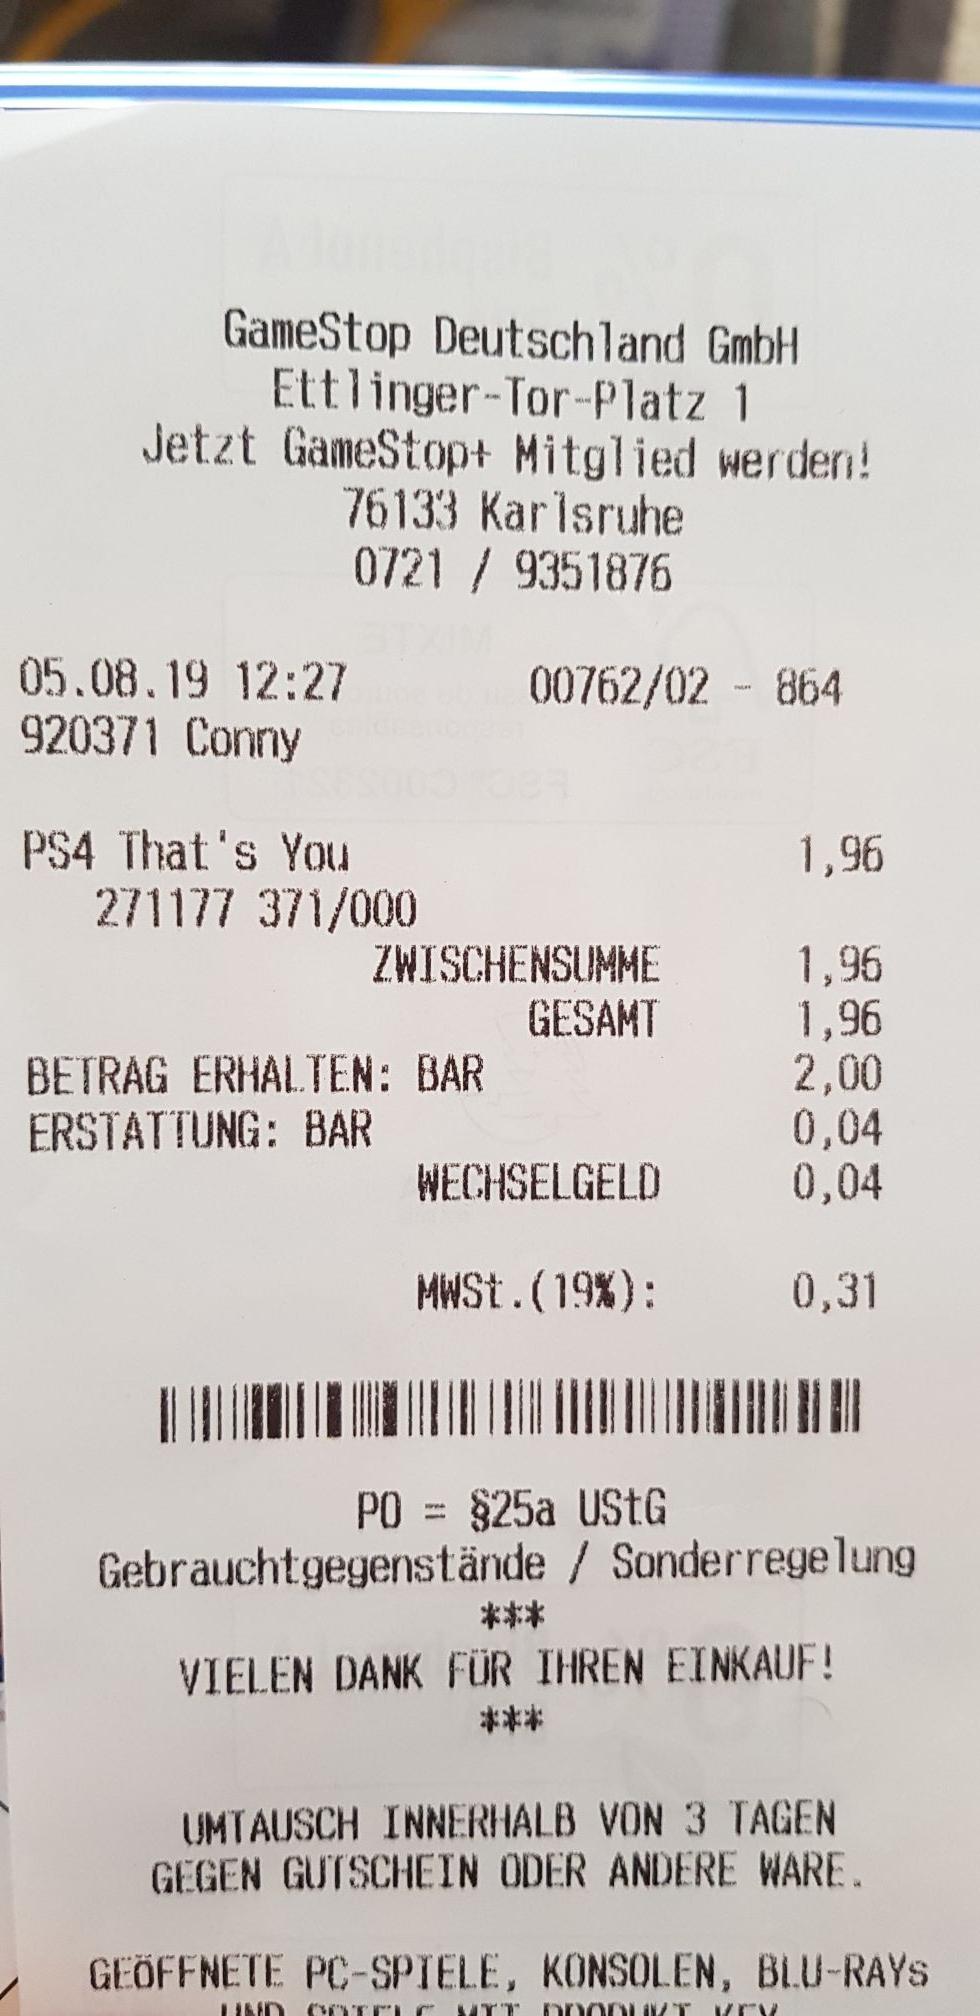 [LOKAL Karlsruhe] That's You! Im Gamestop für 1,96€